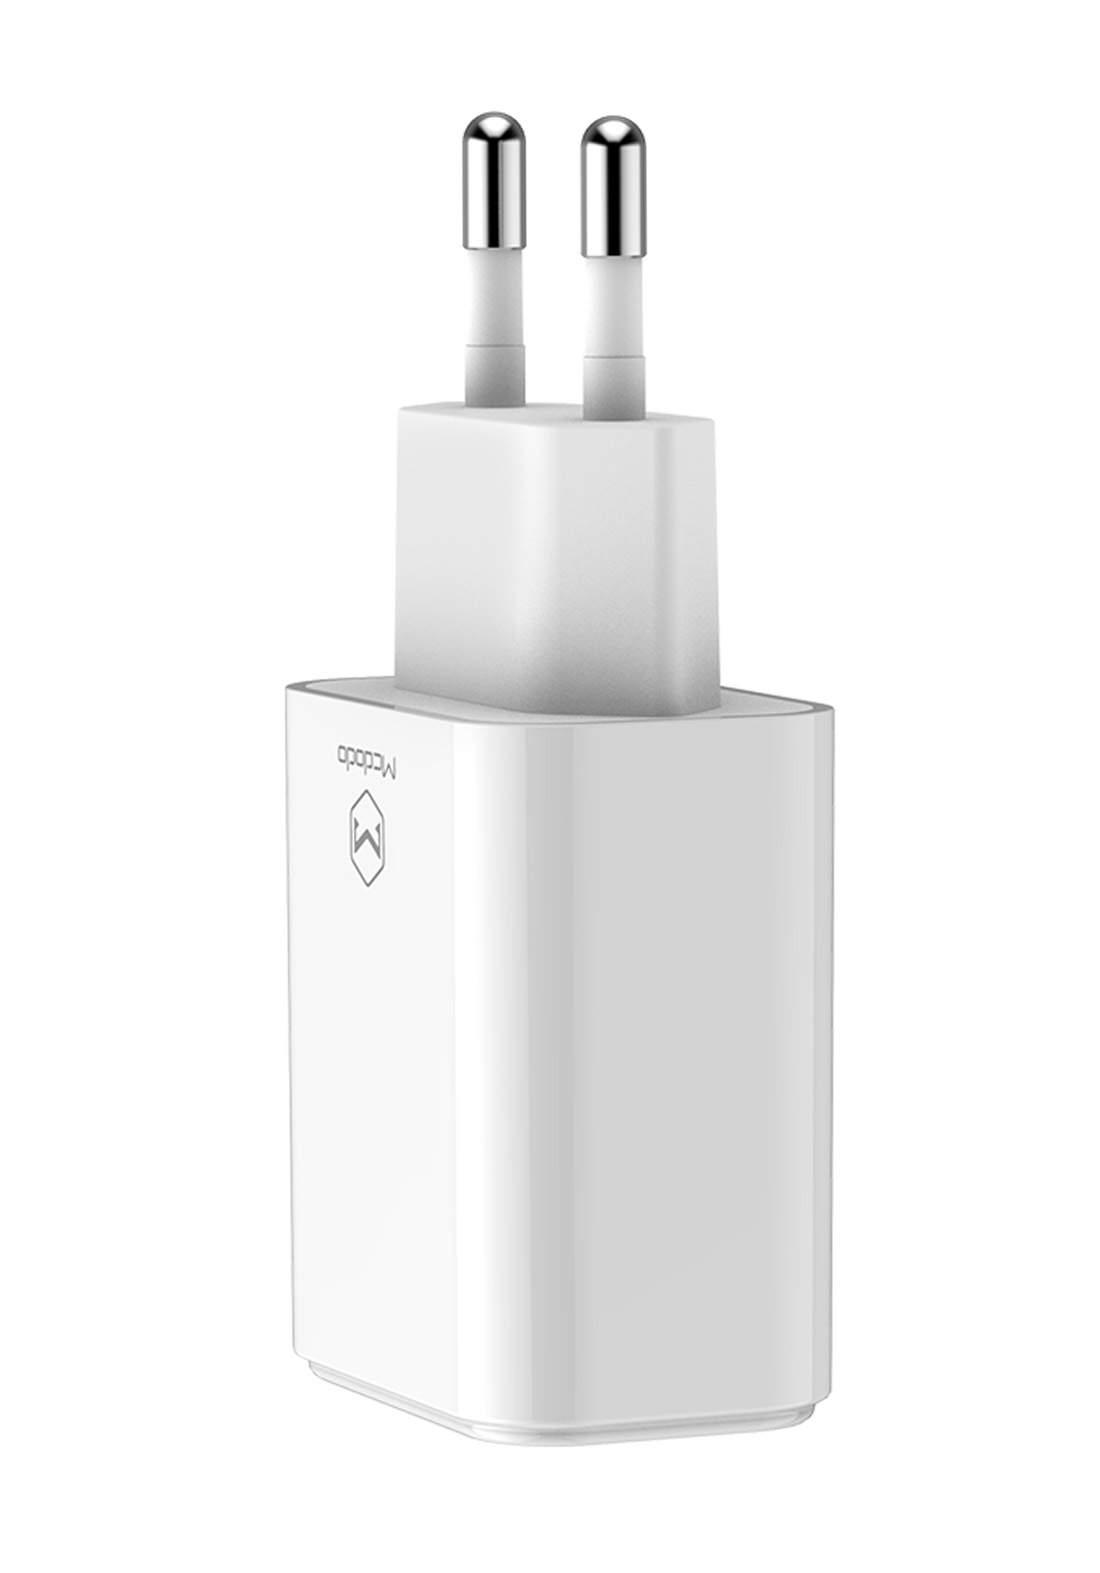 (3503)Mcdodo CH06140 Dual USB Charger EU Plug - White شاحن